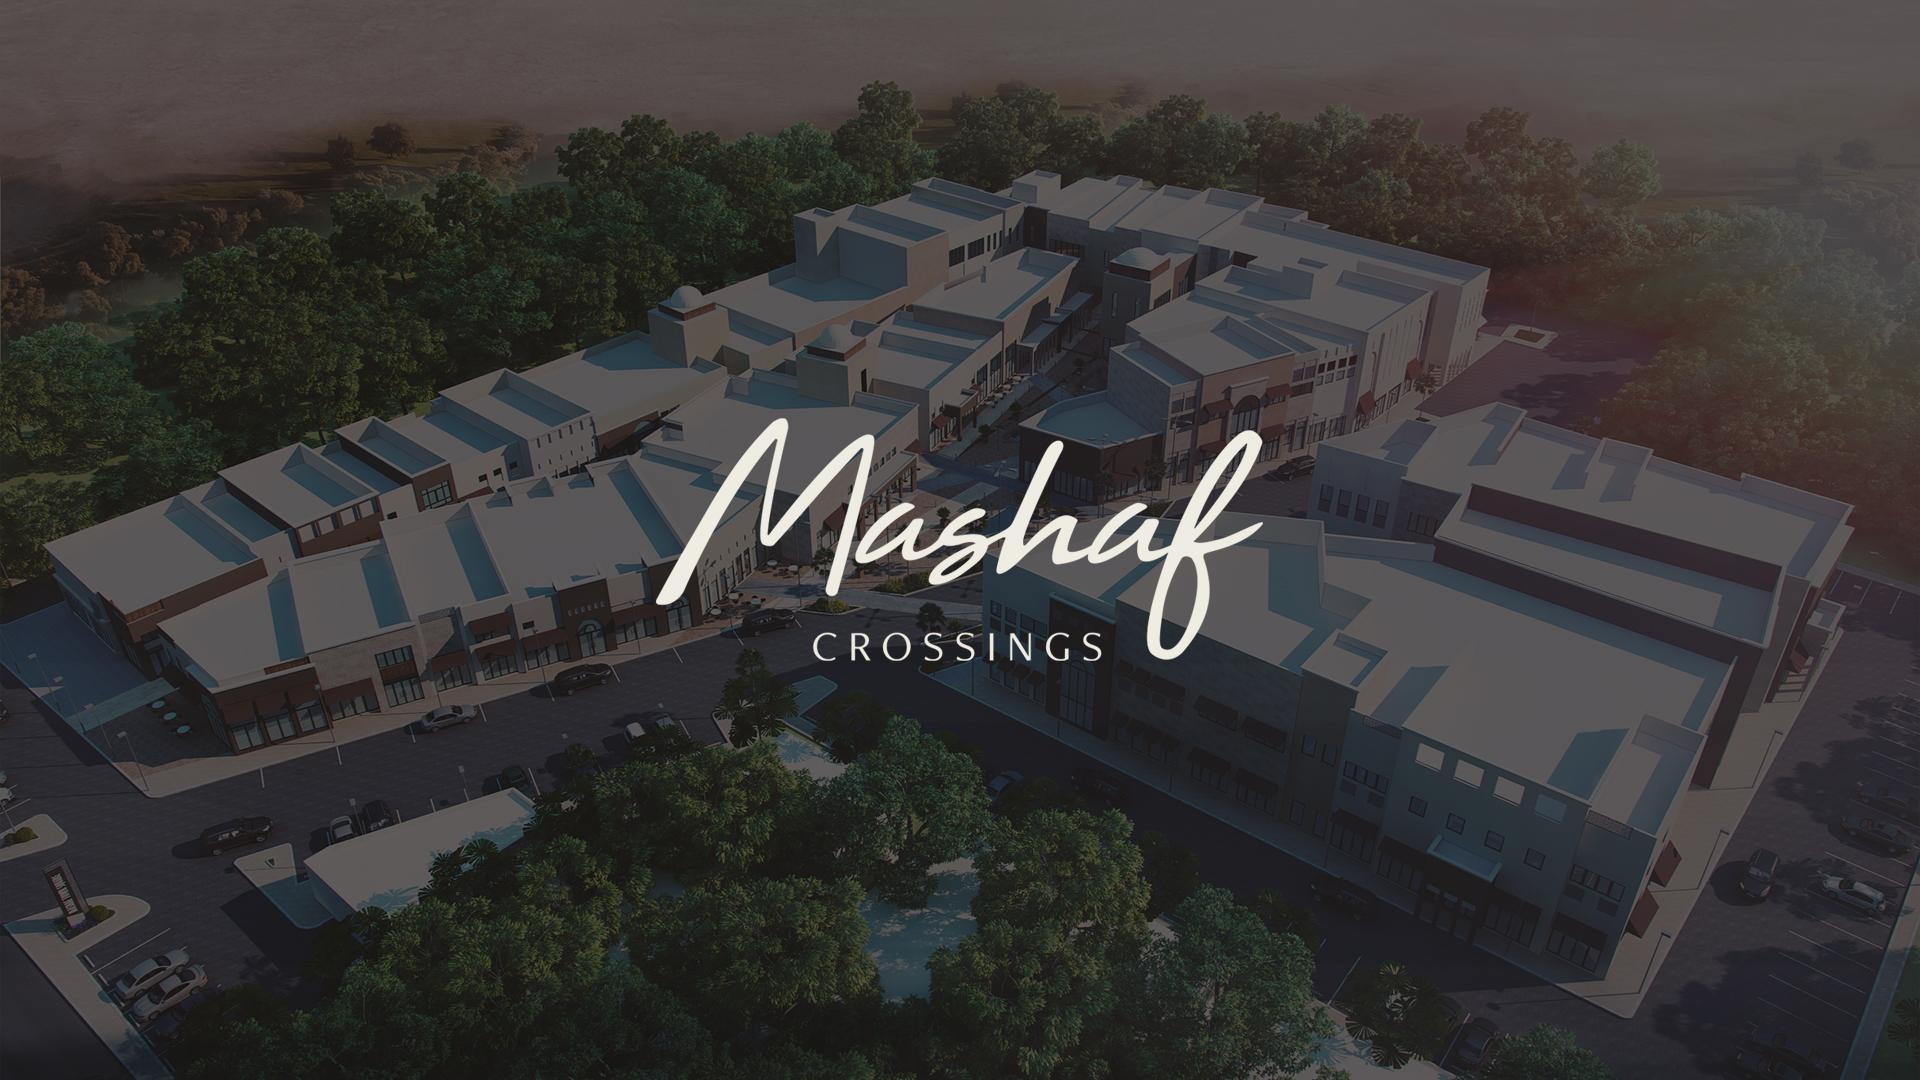 Mashaf Crossings